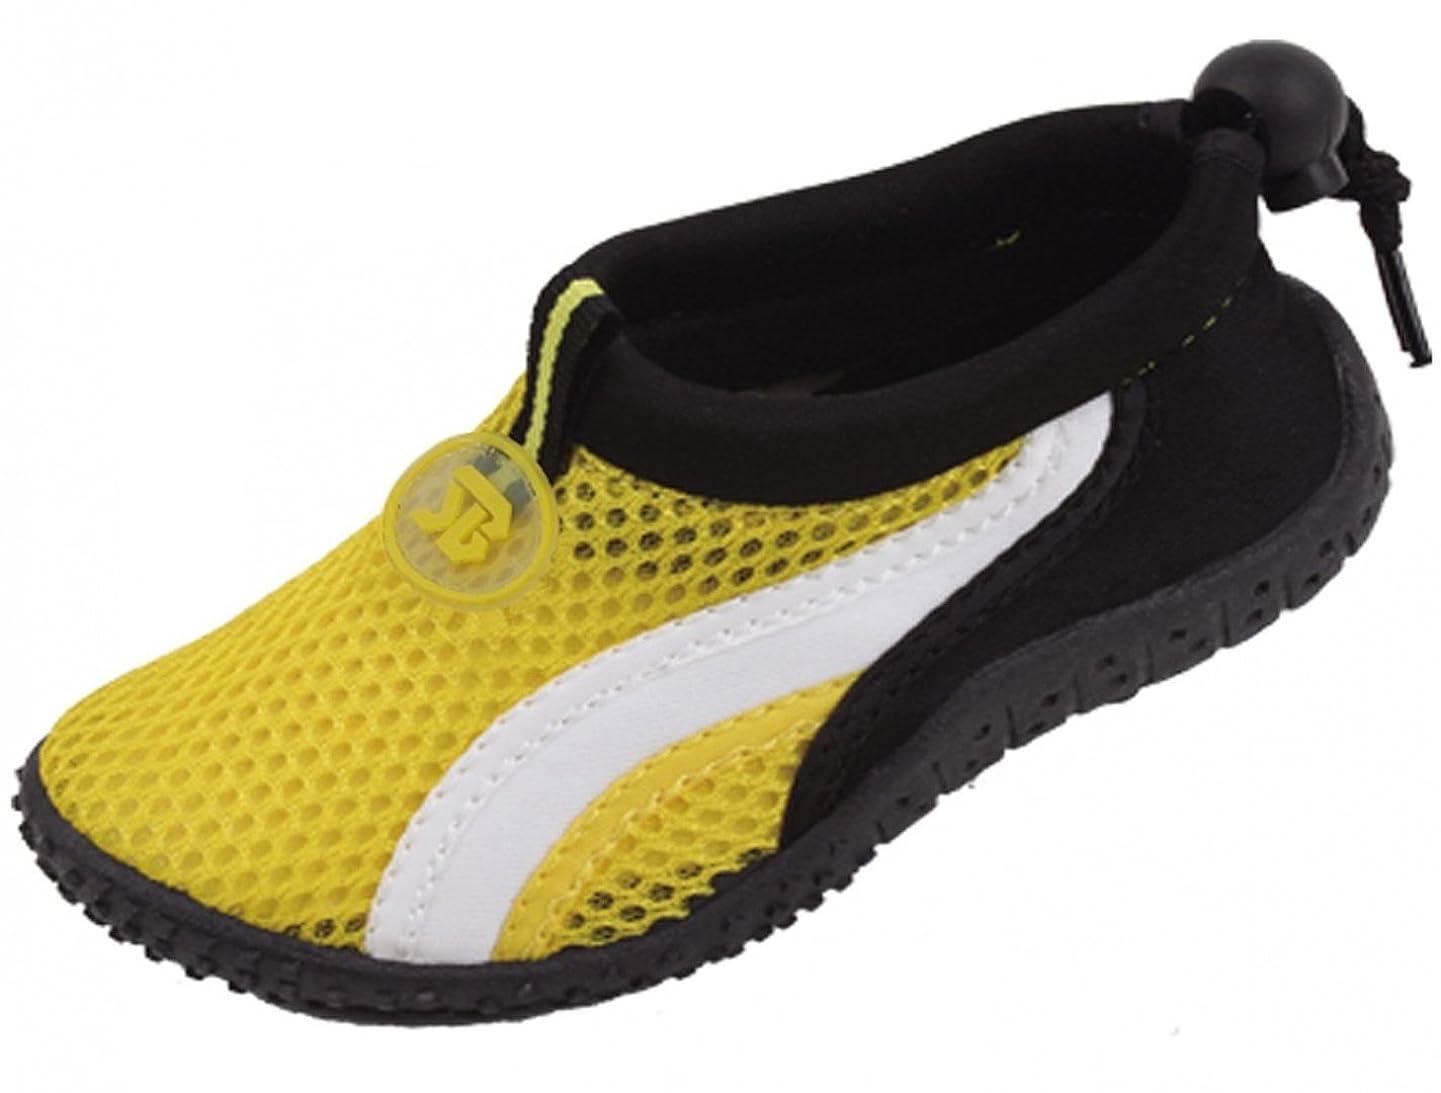 G4U-SVB A7908B Children's 6 Colors Water Shoes Aqua Socks Slip on Athletic Kids Boys Girls Sport Pool Beach Surf ghwvljpxqisq